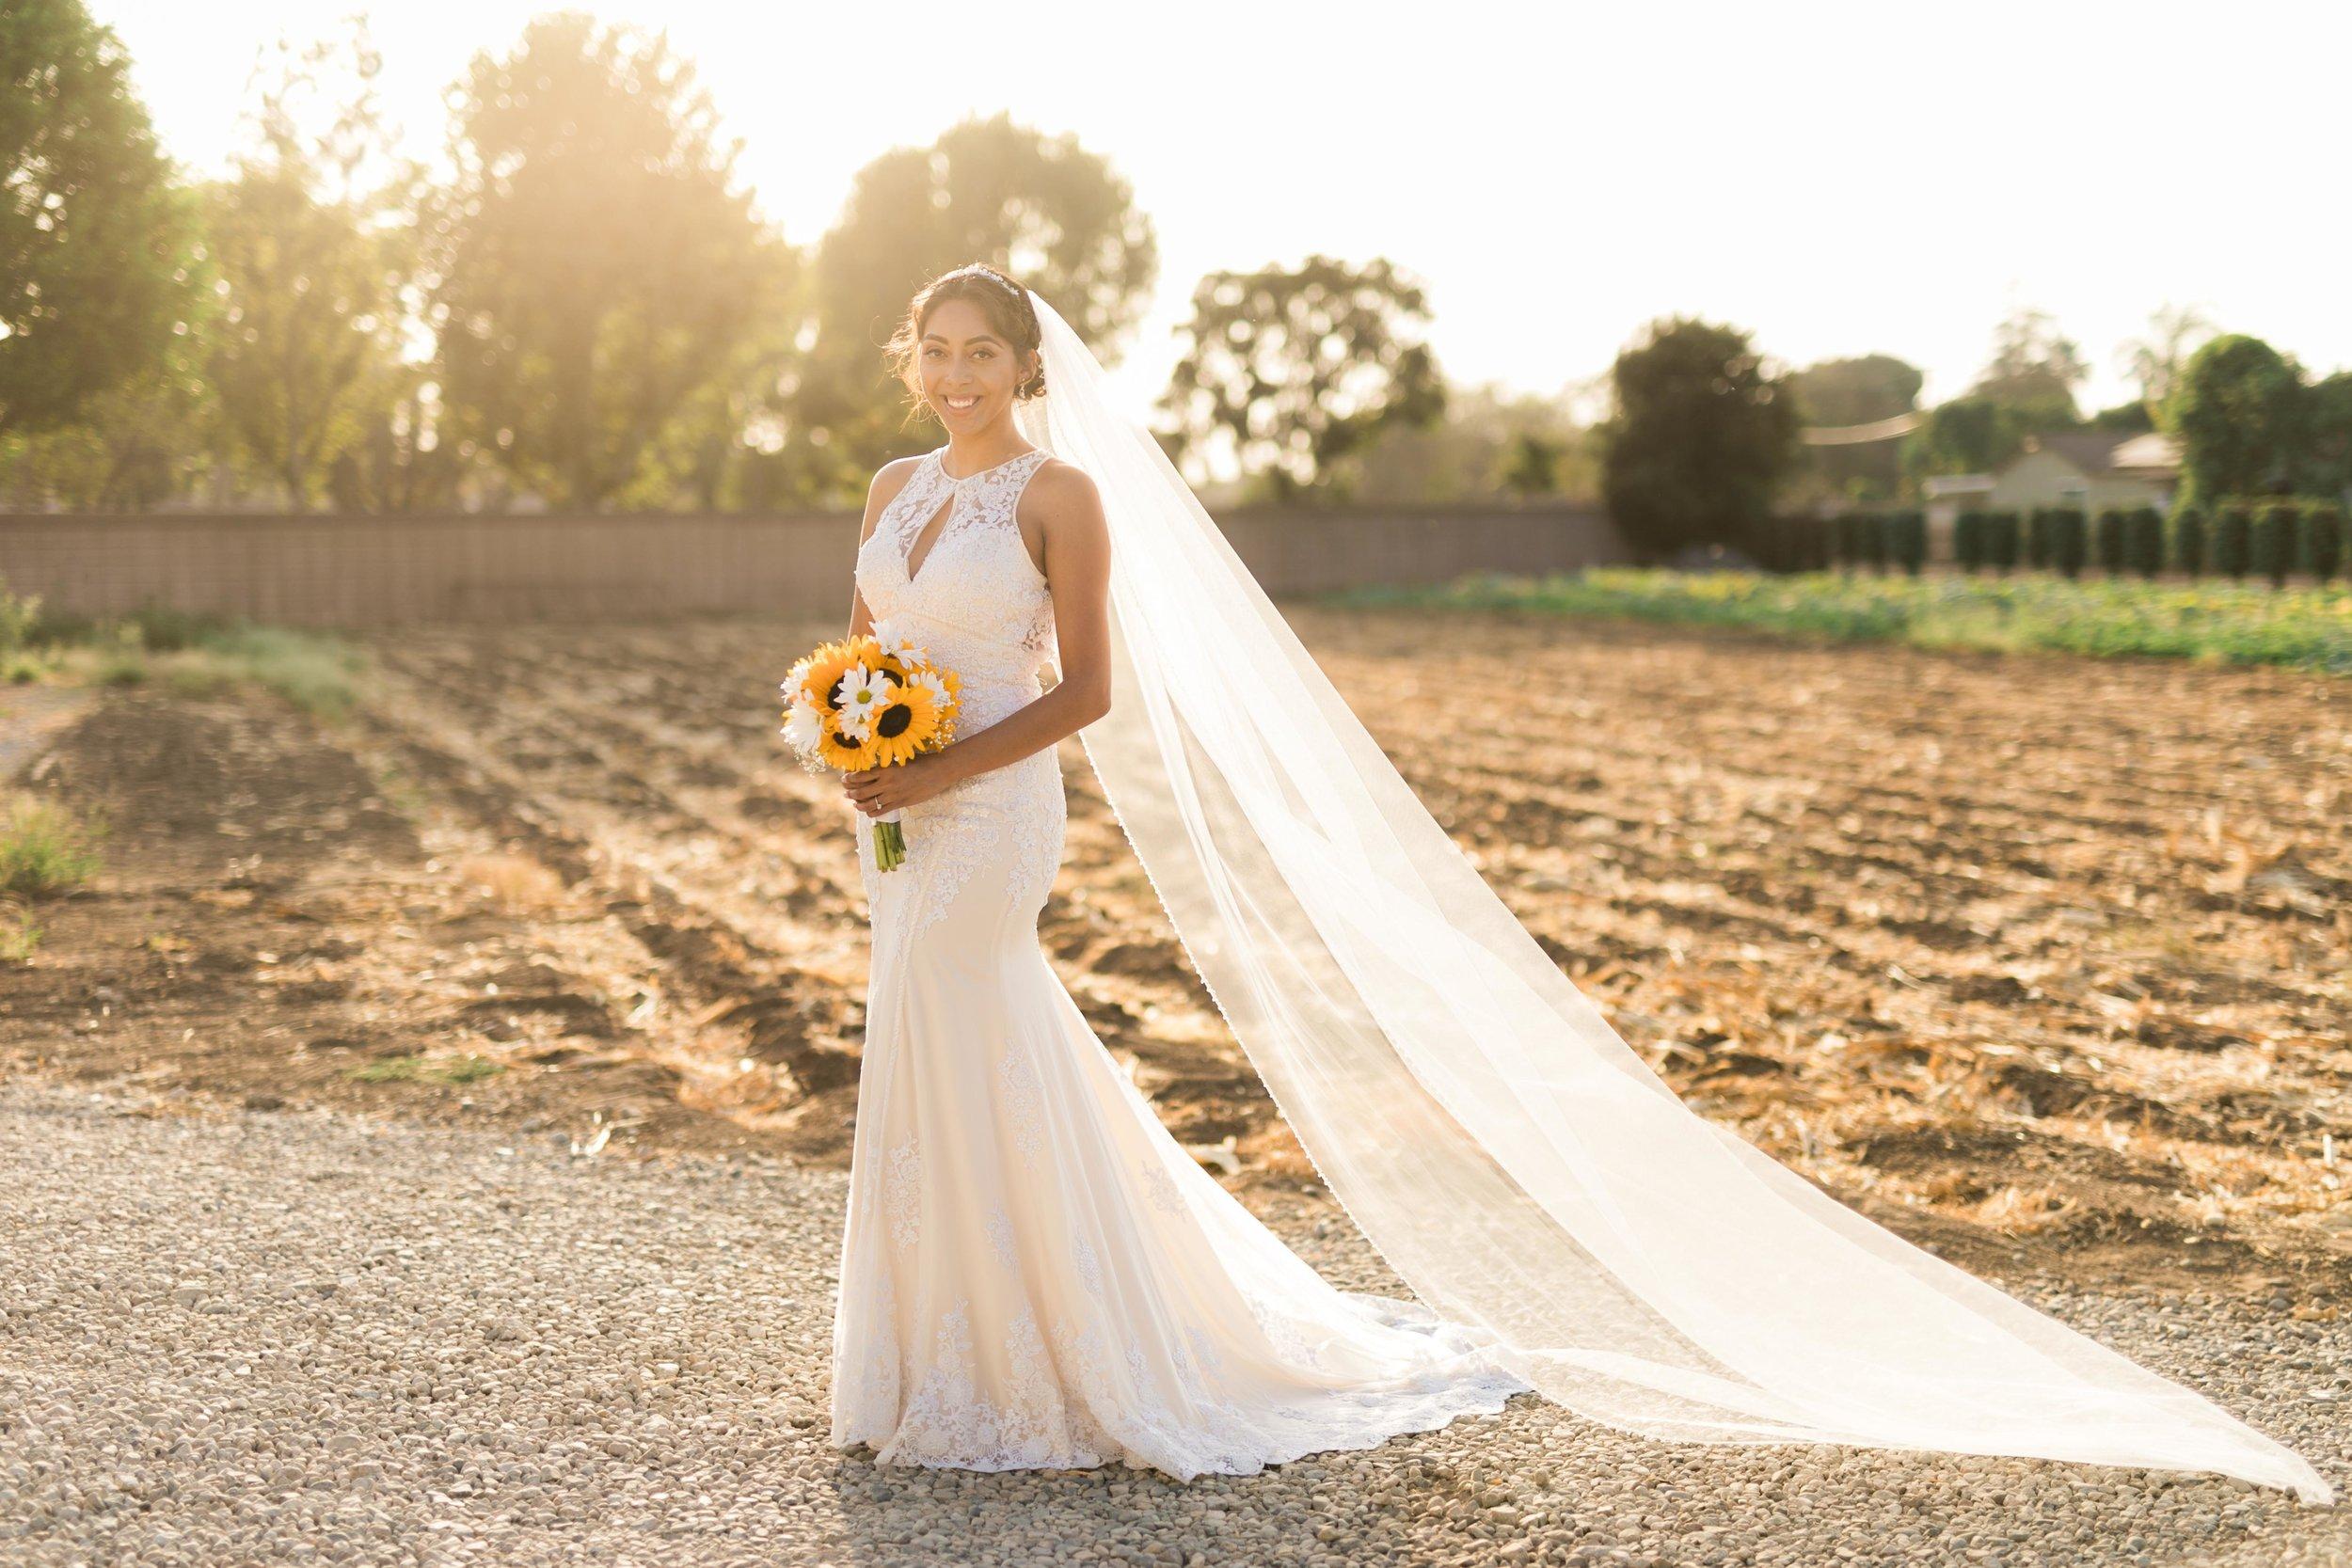 mexican_southern_california_wedding_joshuachun_photography-5.JPG